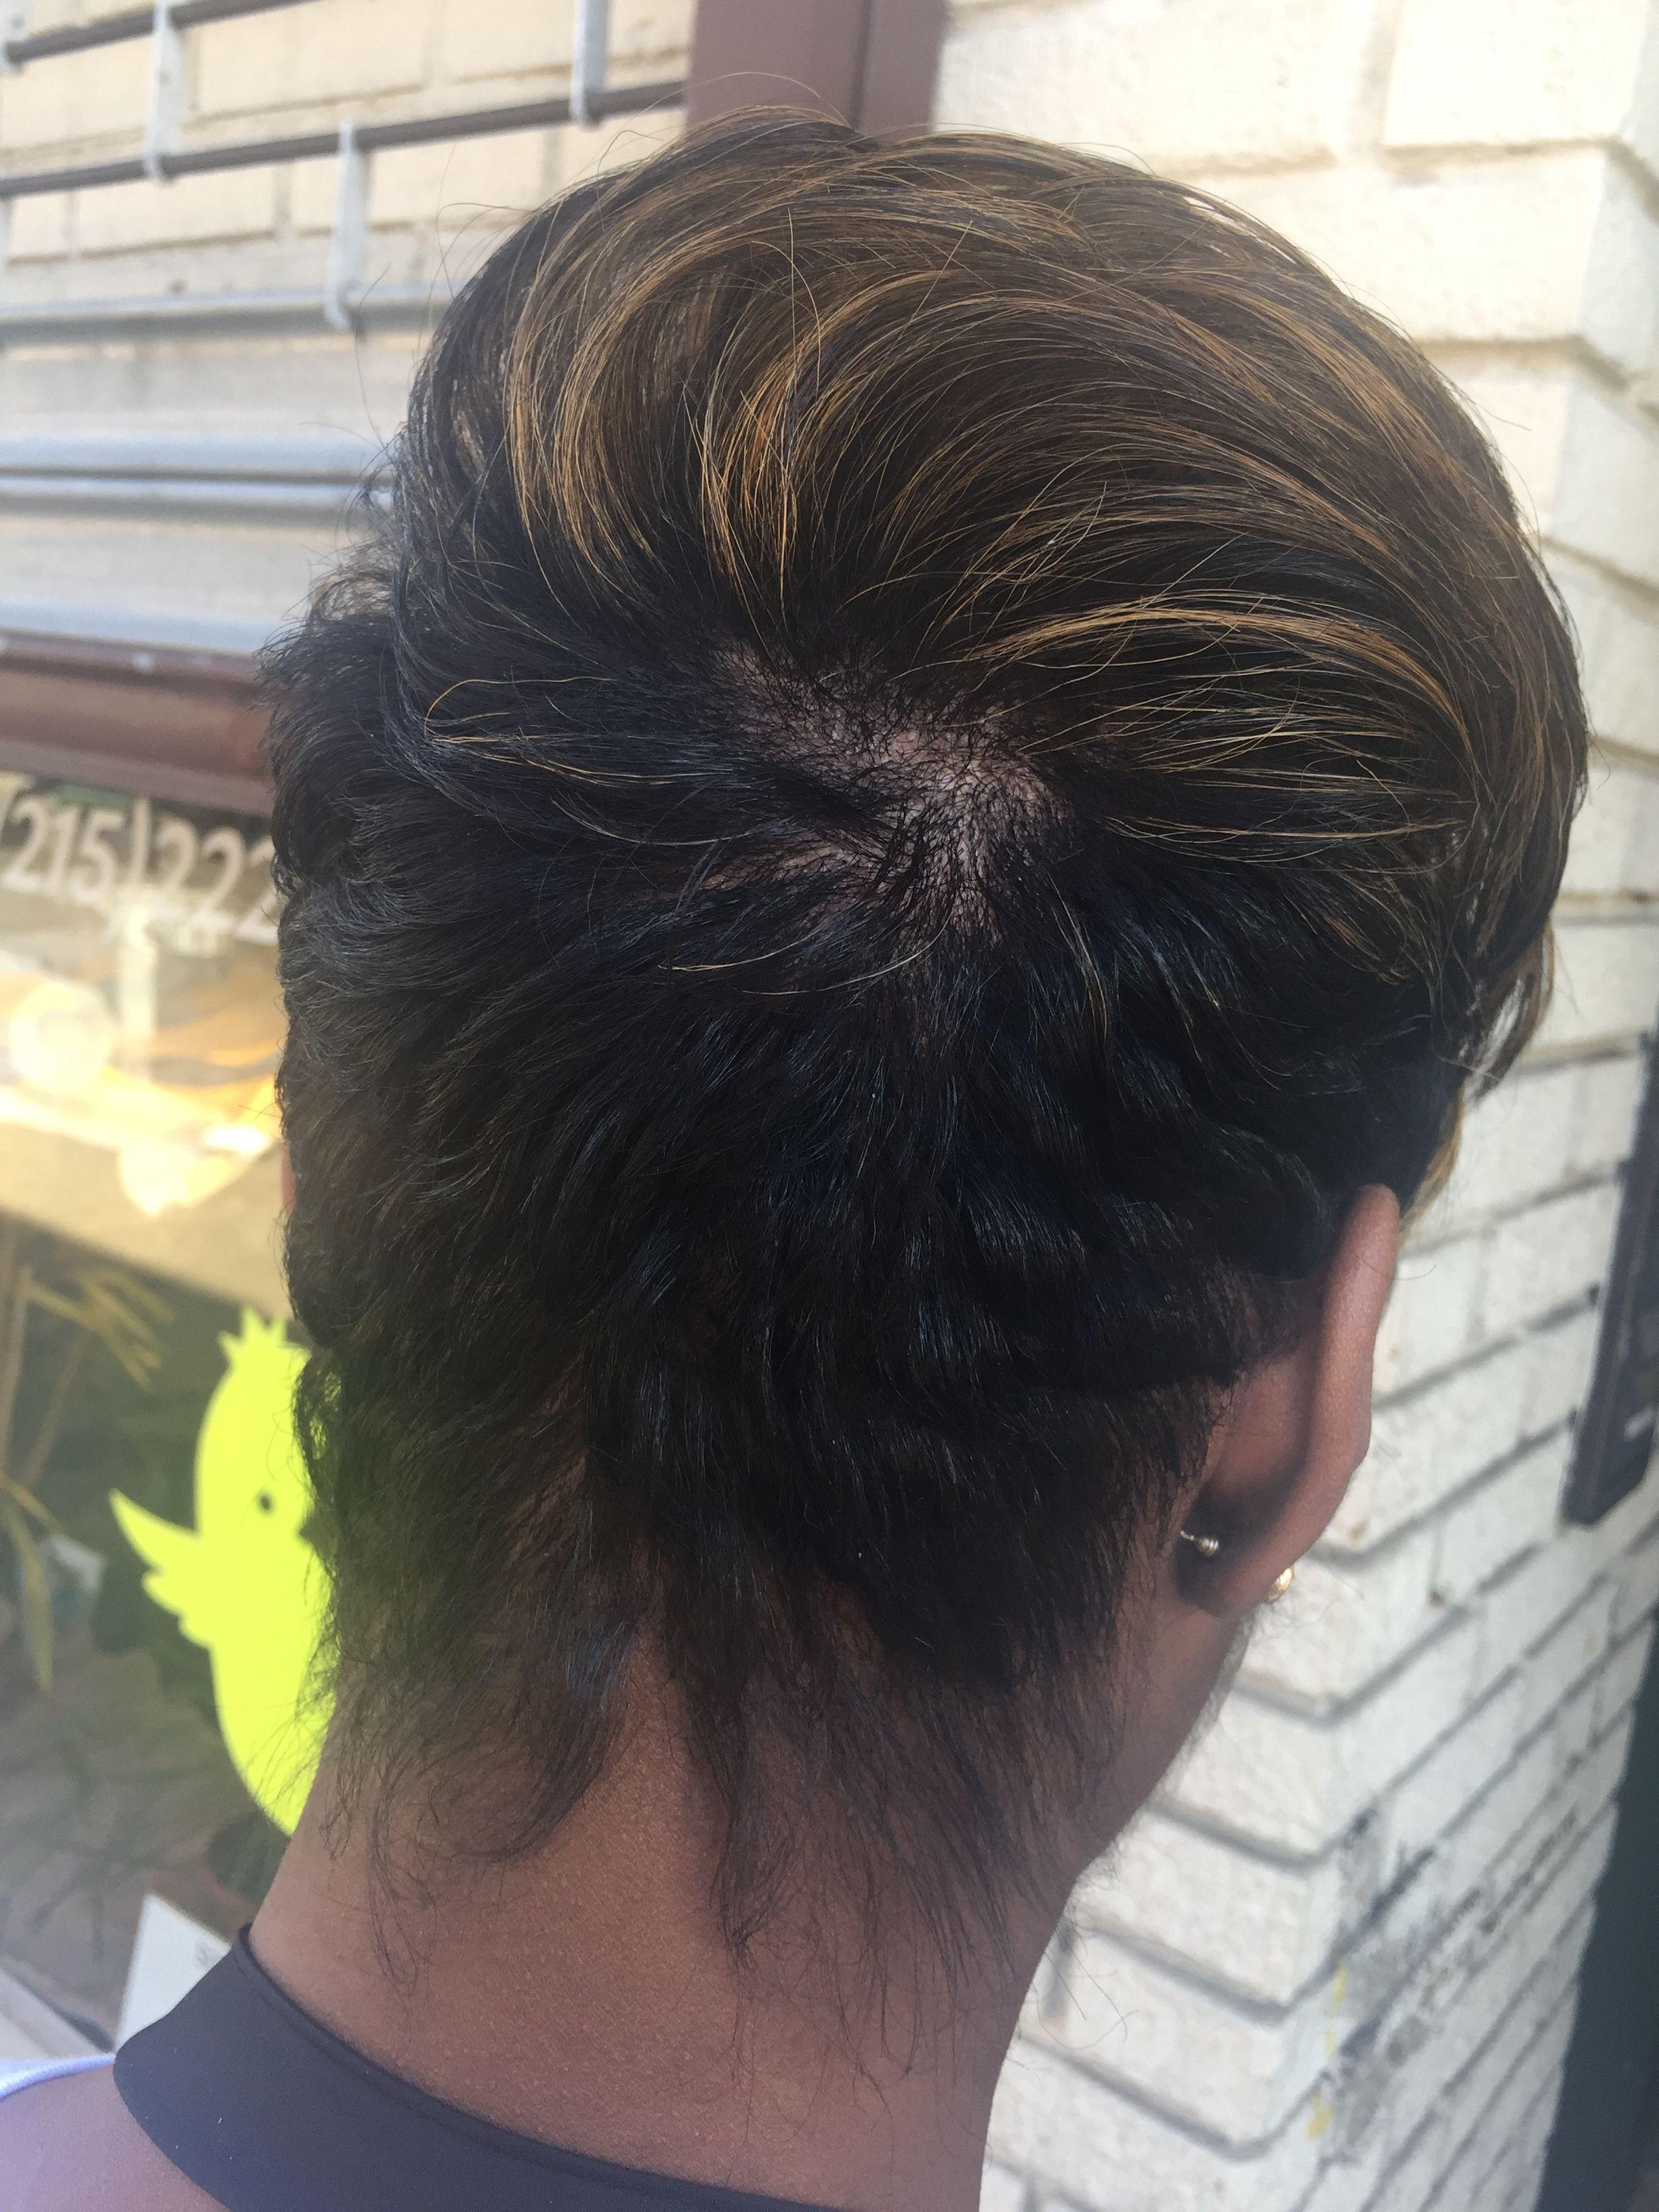 Relaxer Free Hair Stylist Marketia Le Loft Llc Hair Salon Philadelphia Pa Natural Hair Styles Free Hair Hair Styles